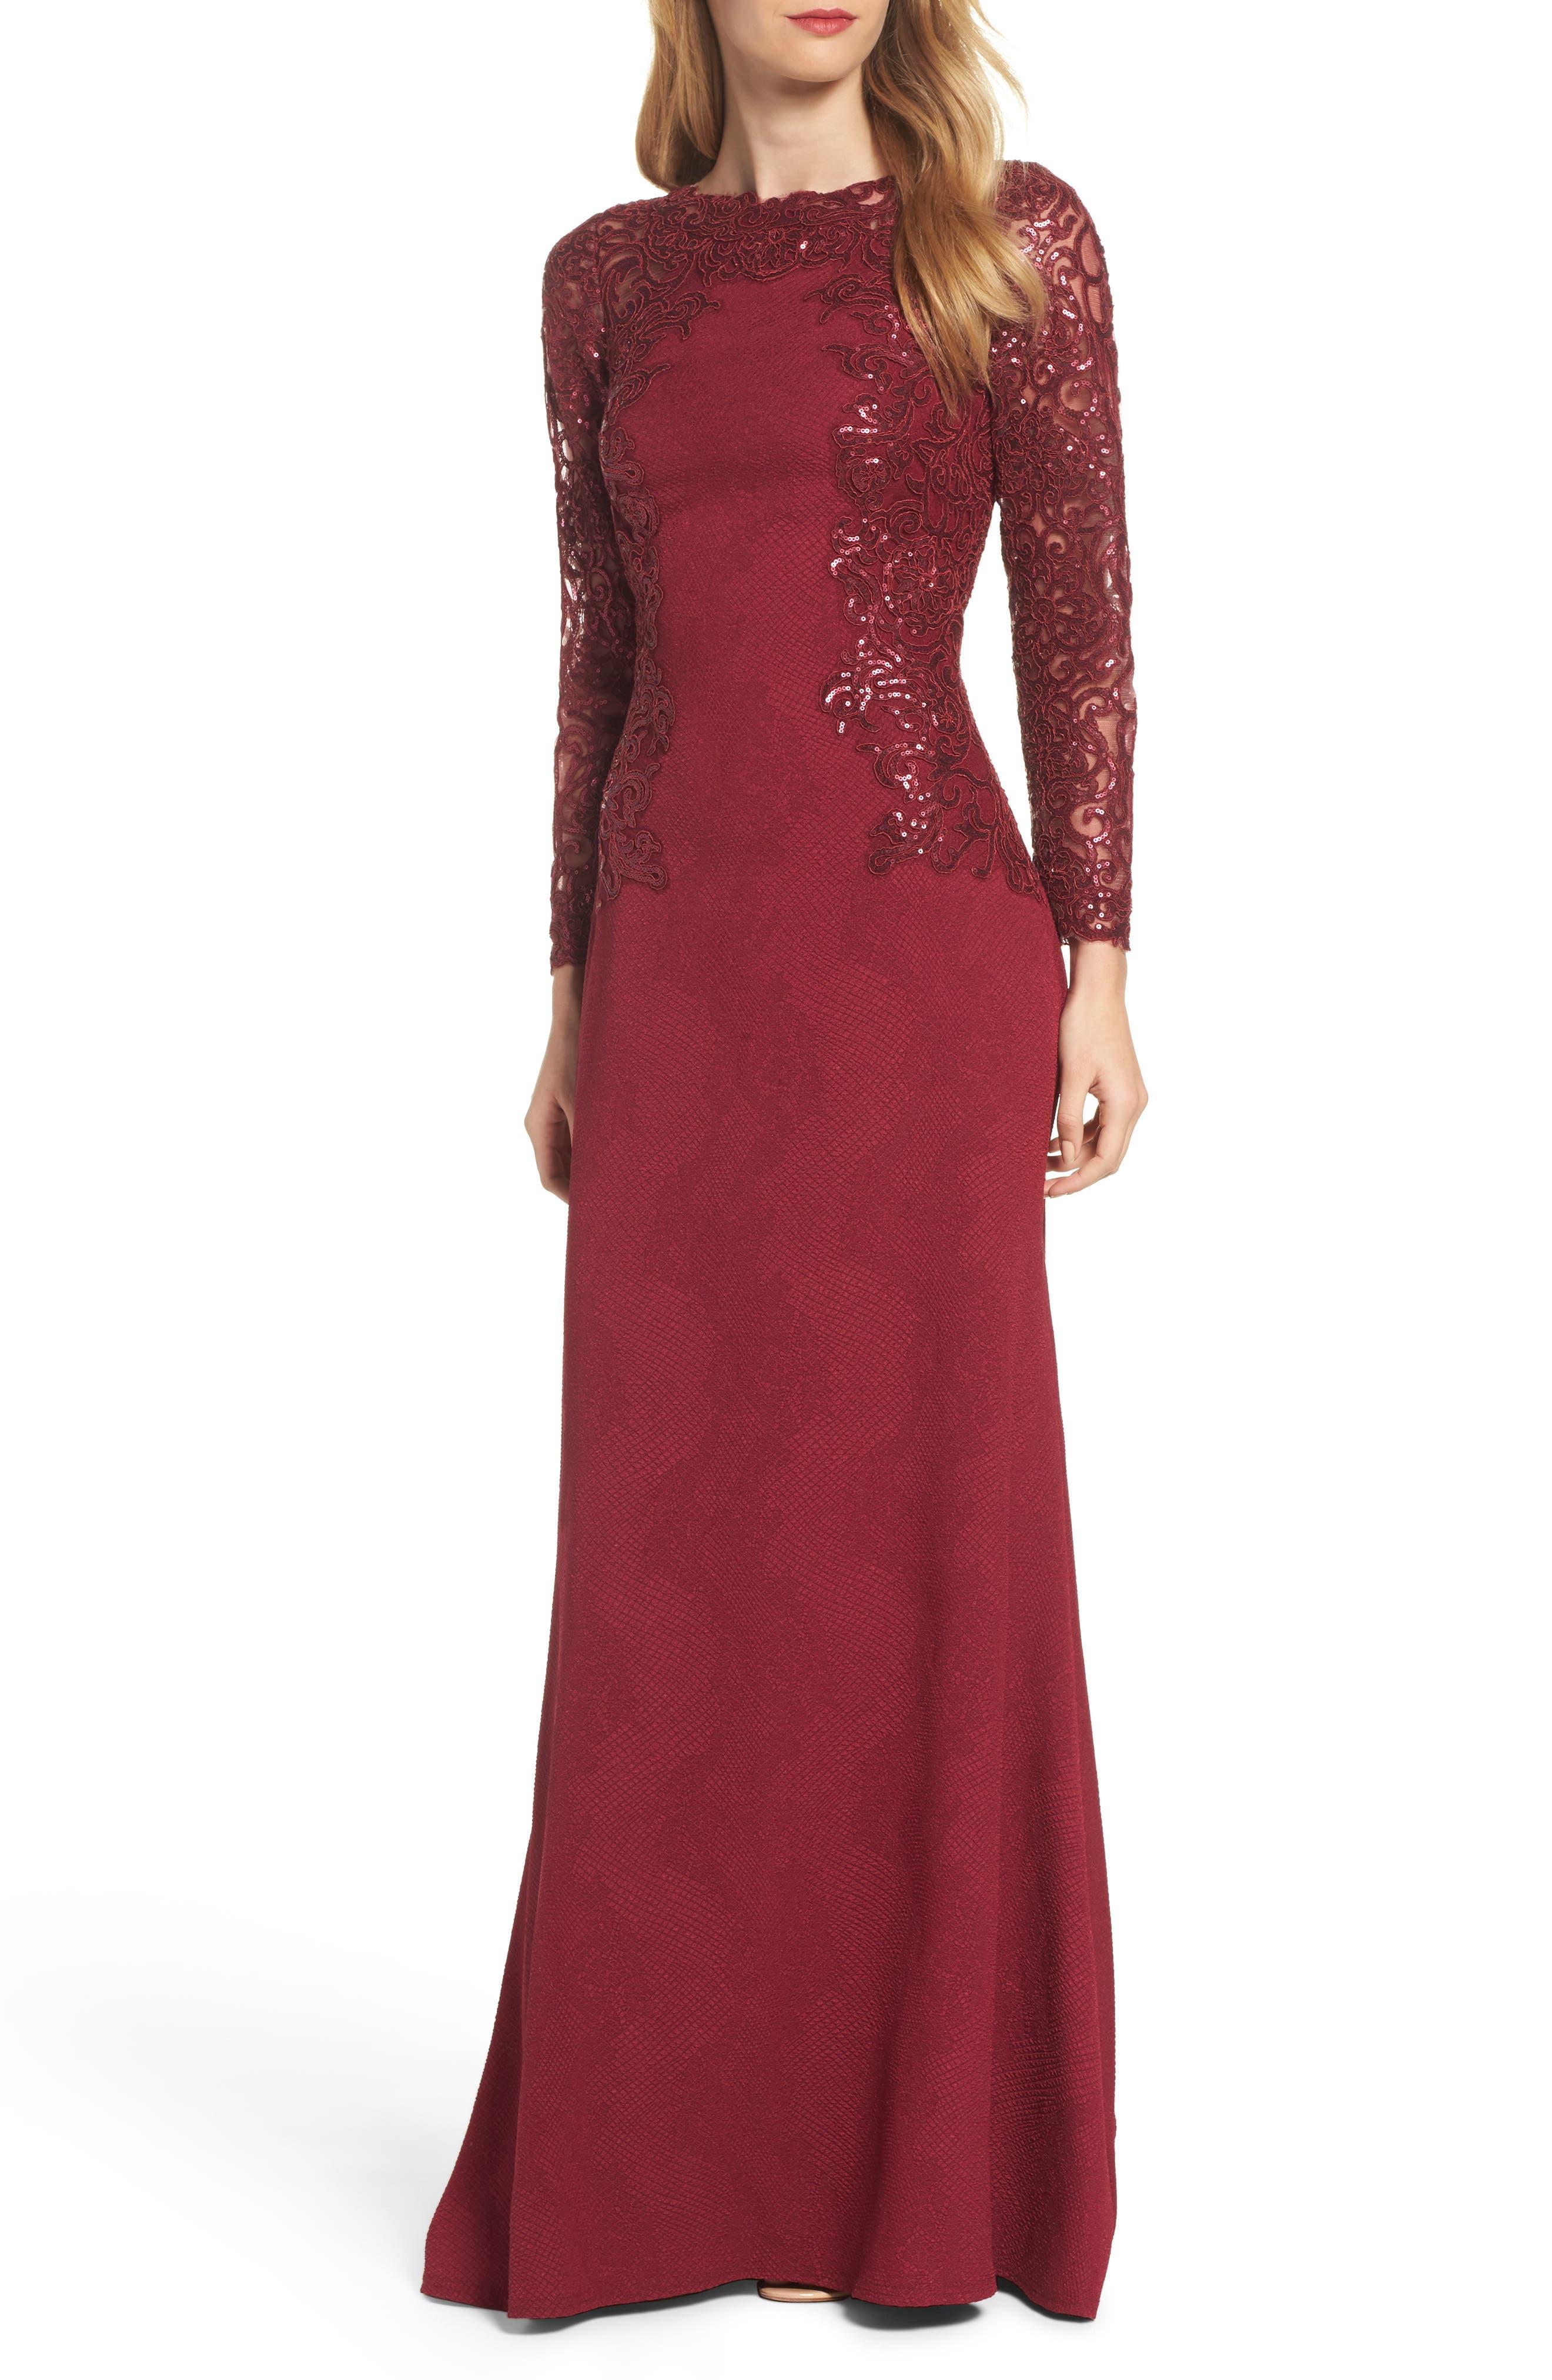 Tadashi Shoji Sequin Embellished Crepe Gown